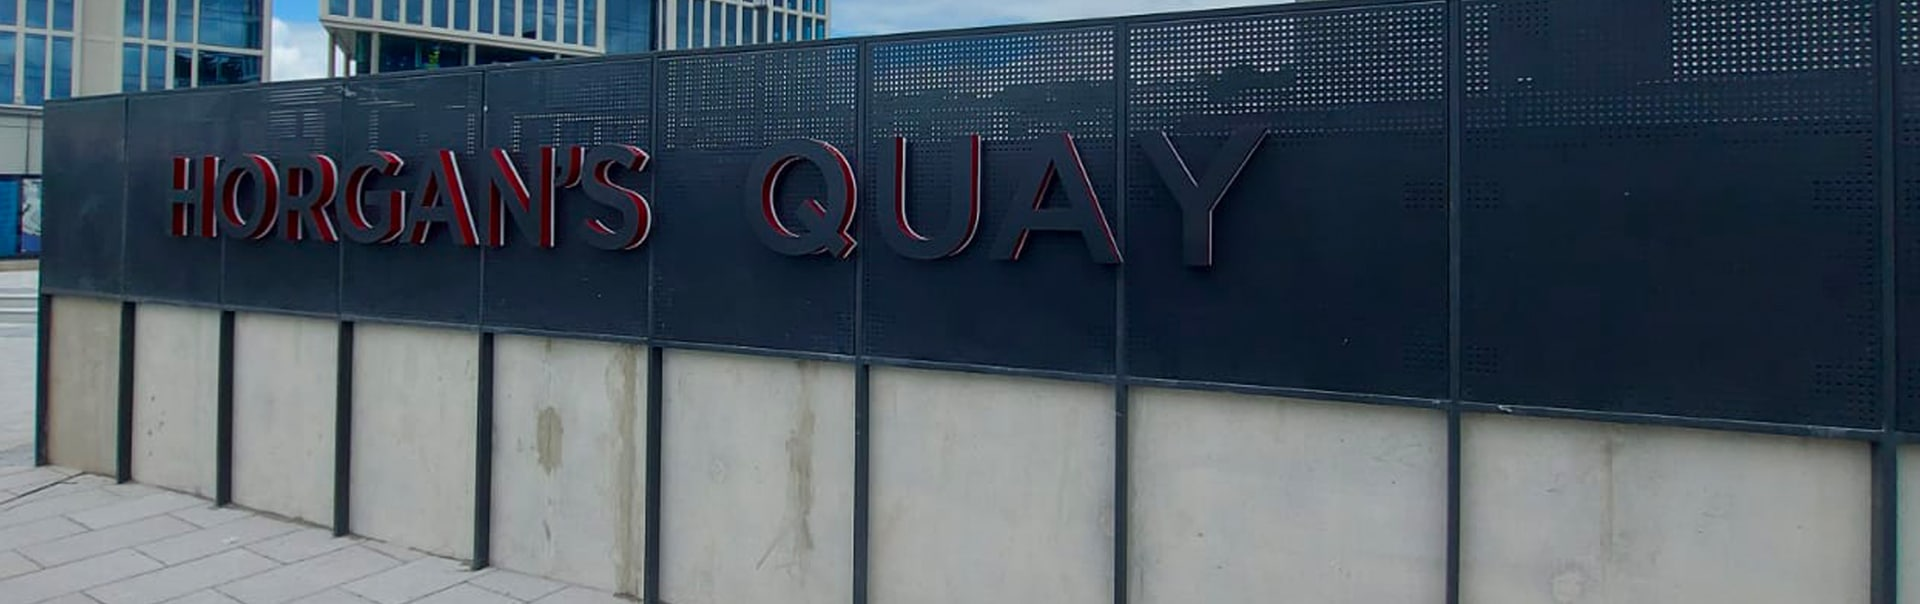 An illuminated logo announces the new city quarter at Horgan's Quay